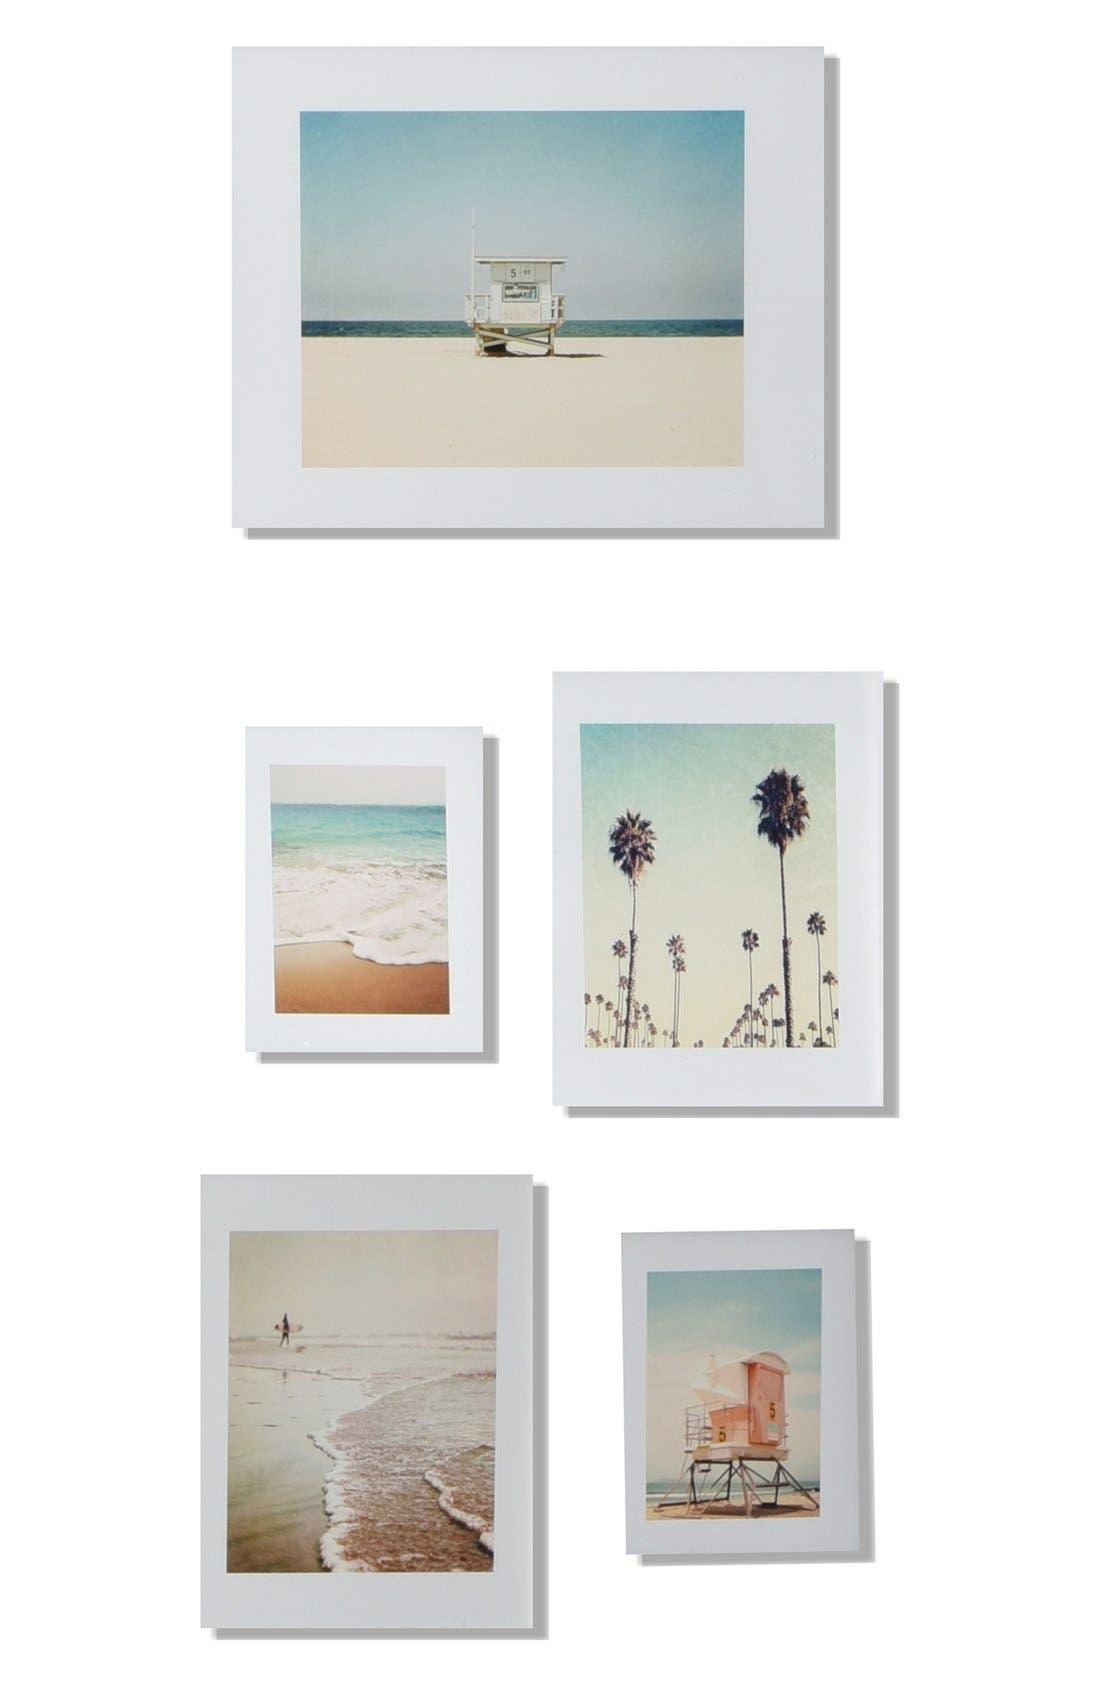 DENY DESIGNS, '5th Street' Wall Art Print Set, Main thumbnail 1, color, WHITE